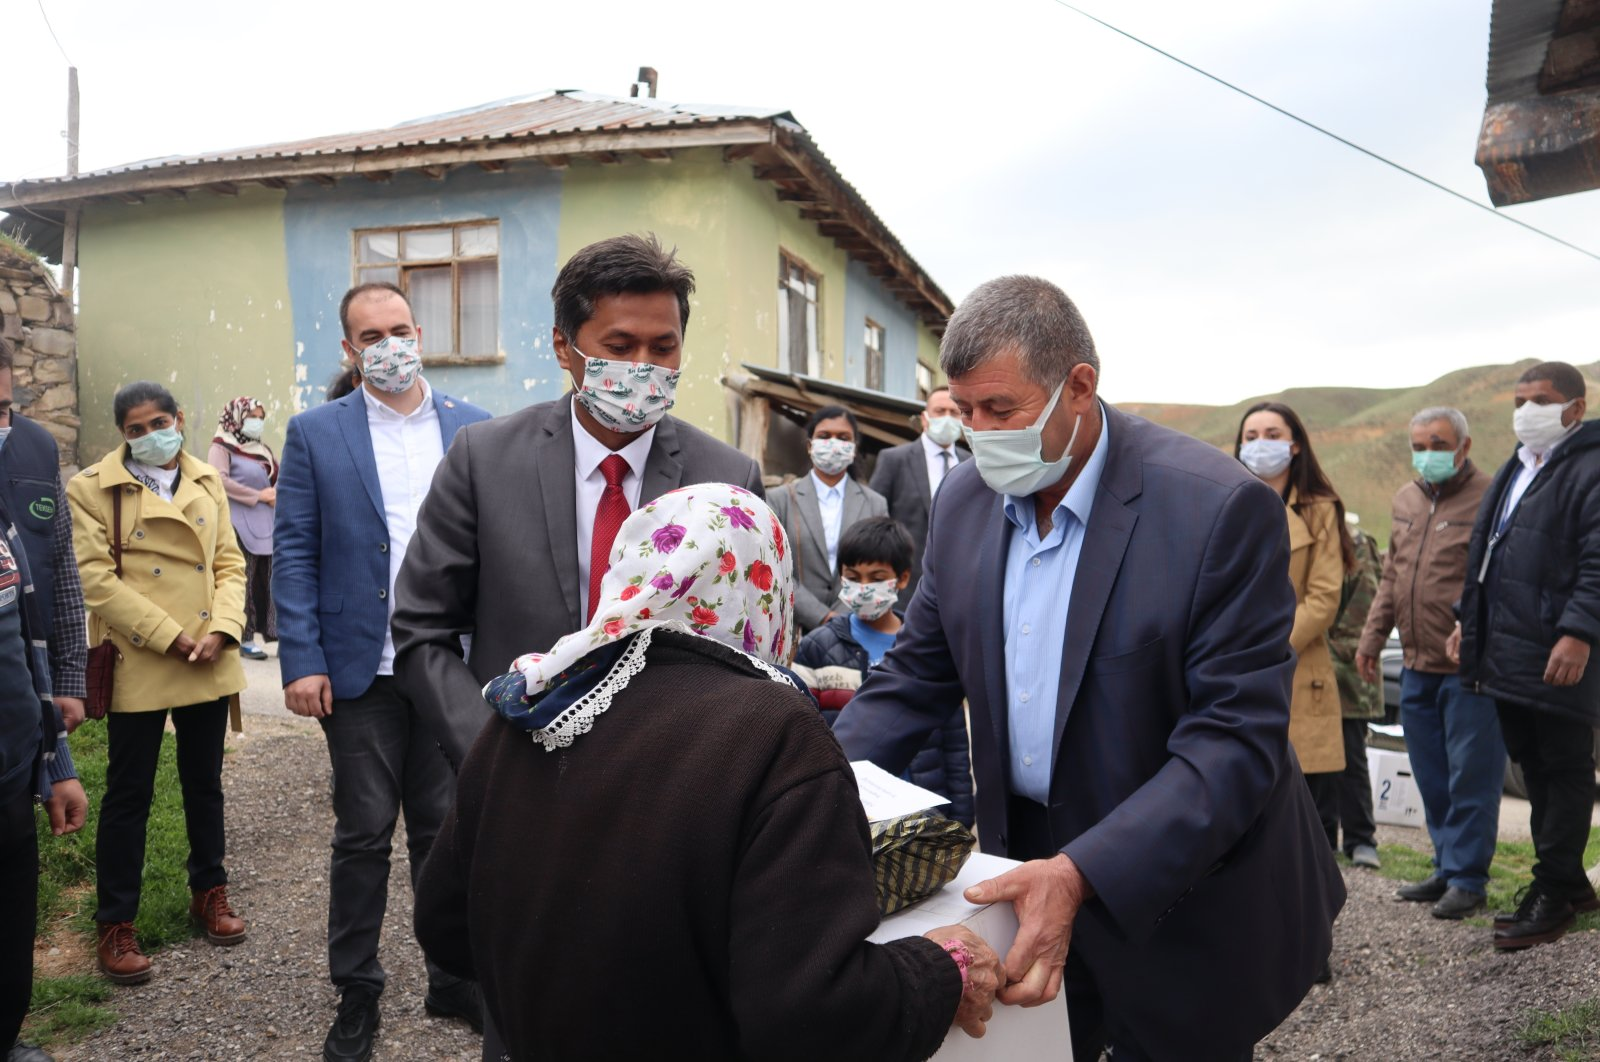 Sri Lanka's Ambassador Mohamed Rizvi Hassen and embassy staff distribute Ramadan aid in Ankara's Yaylabağ village, Turkey, April 26, 2021. (Photo by Dilara Aslan)